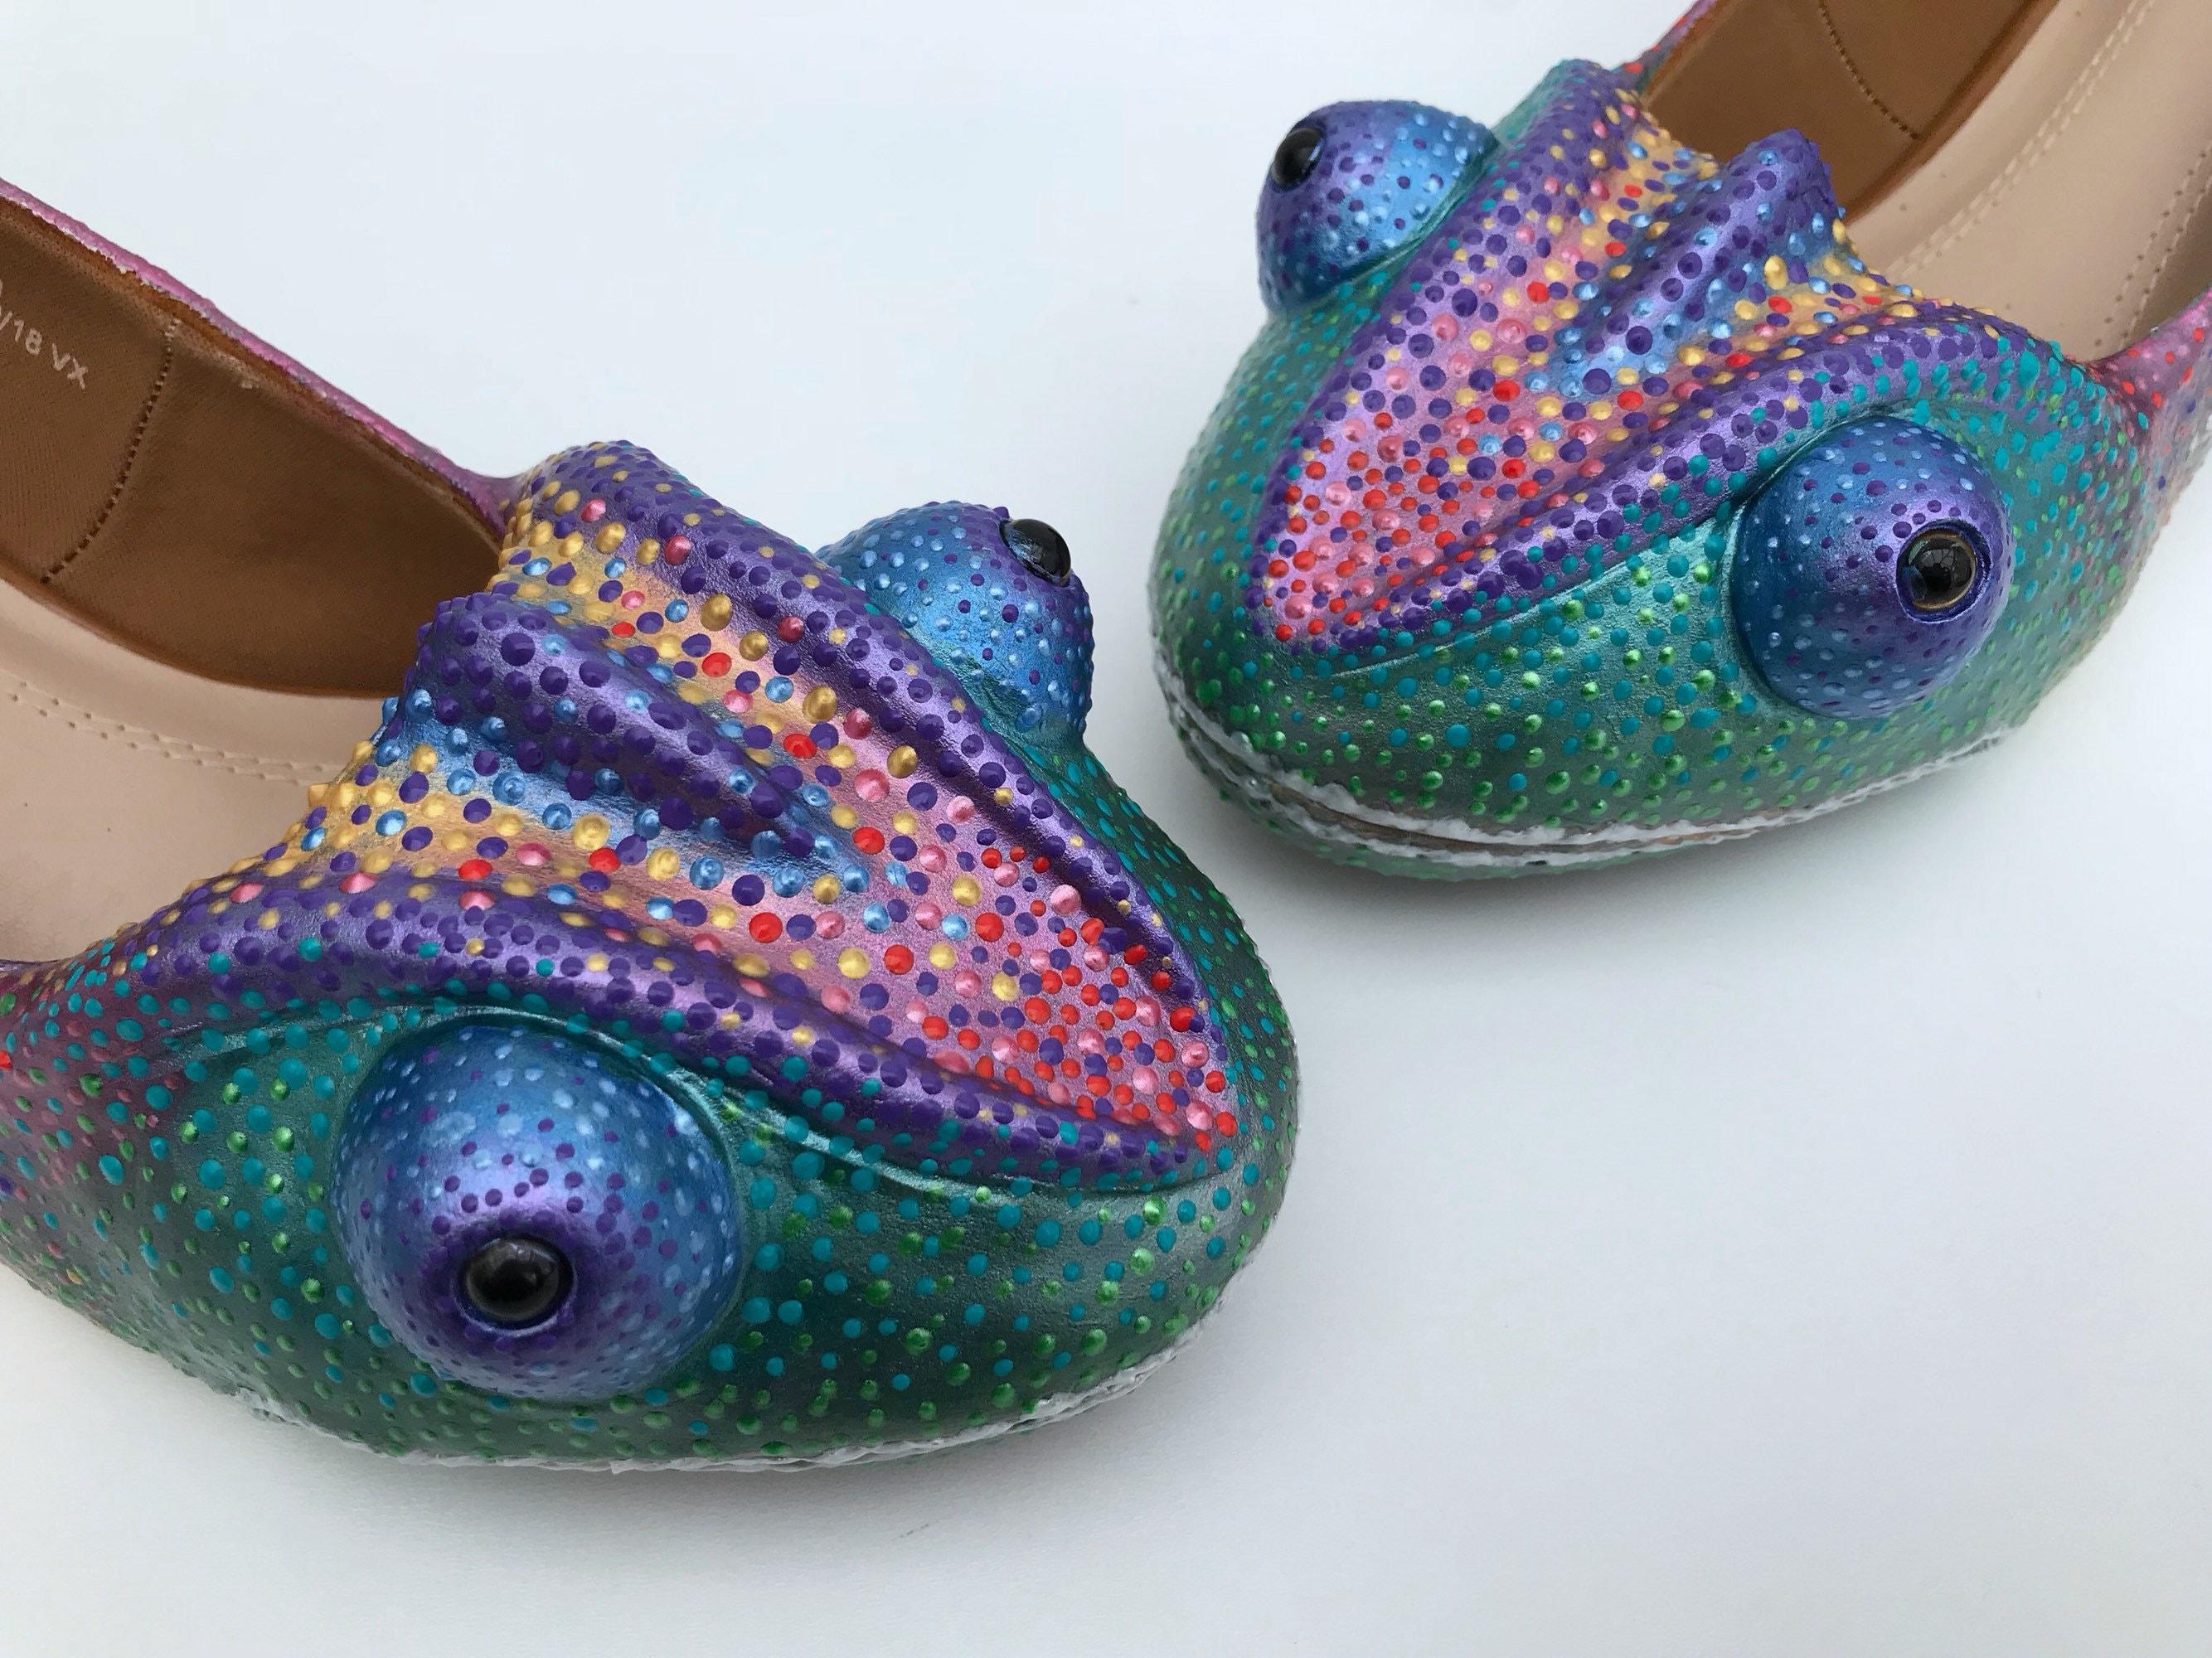 Sculpted Rainbow Chameleon Heels - Sculpted Shoes Shoes - Customised 3D Shoes Sculpted - Animal Shoes - Lizard - Pet - Party - Bridal - Prom - UK size 3-8 1d4a64